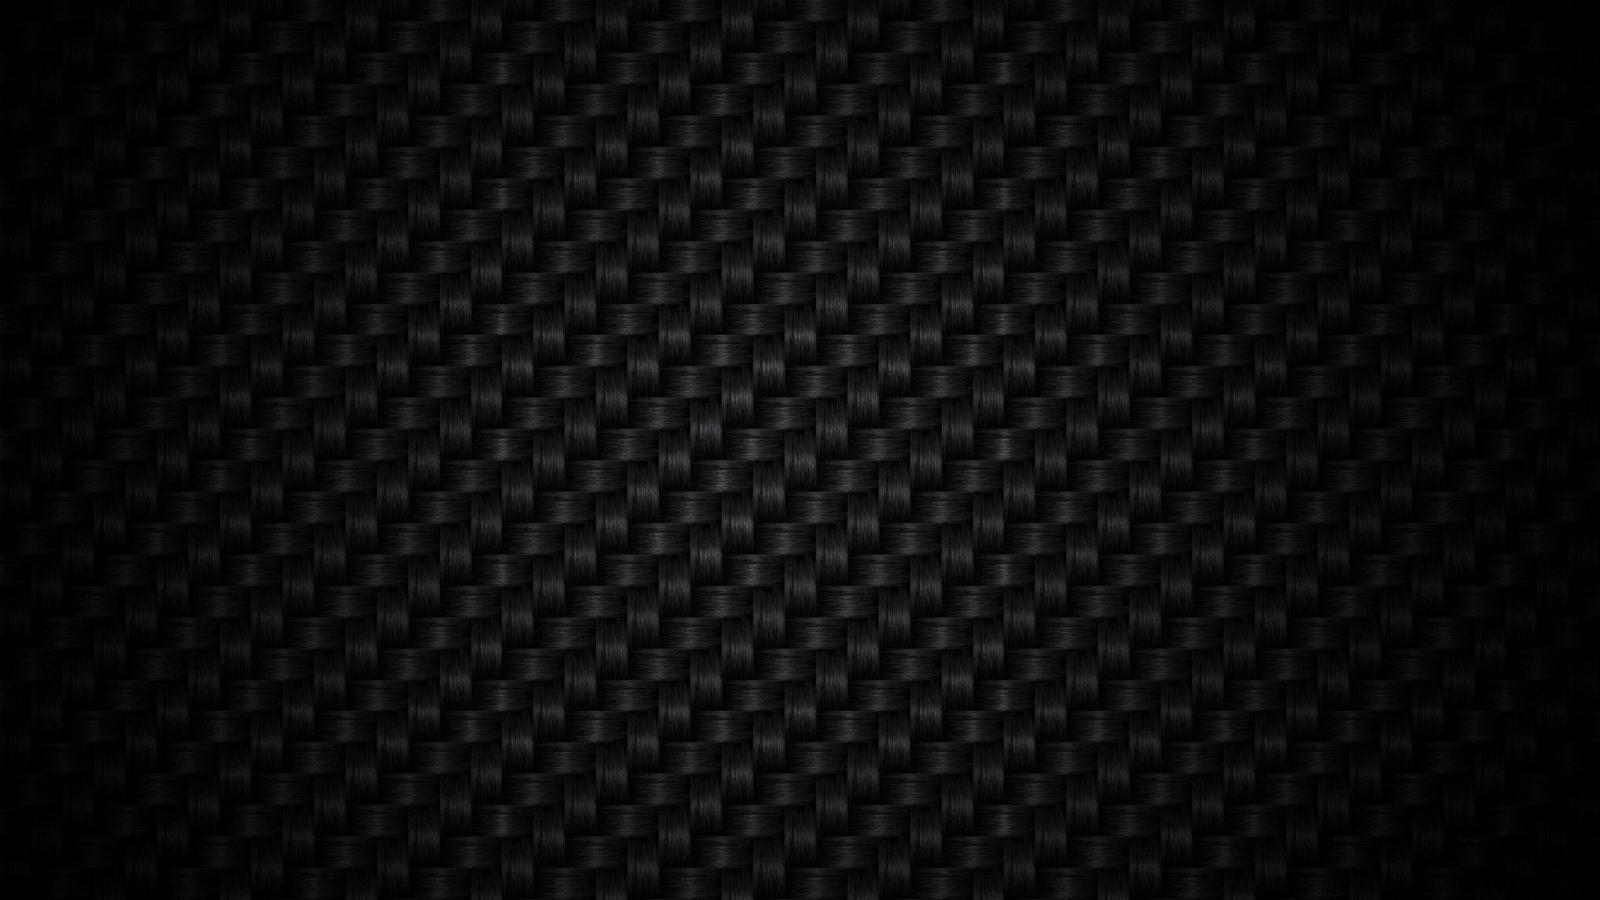 Free Download Black Texture Desktop Wallpaper Download Black Texture Wallpaper In Hd 2560x1570 For Your Desktop Mobile Tablet Explore 48 Hd Texture Background Wallpaper Wallpaper Textures Hd Wood Wallpaper